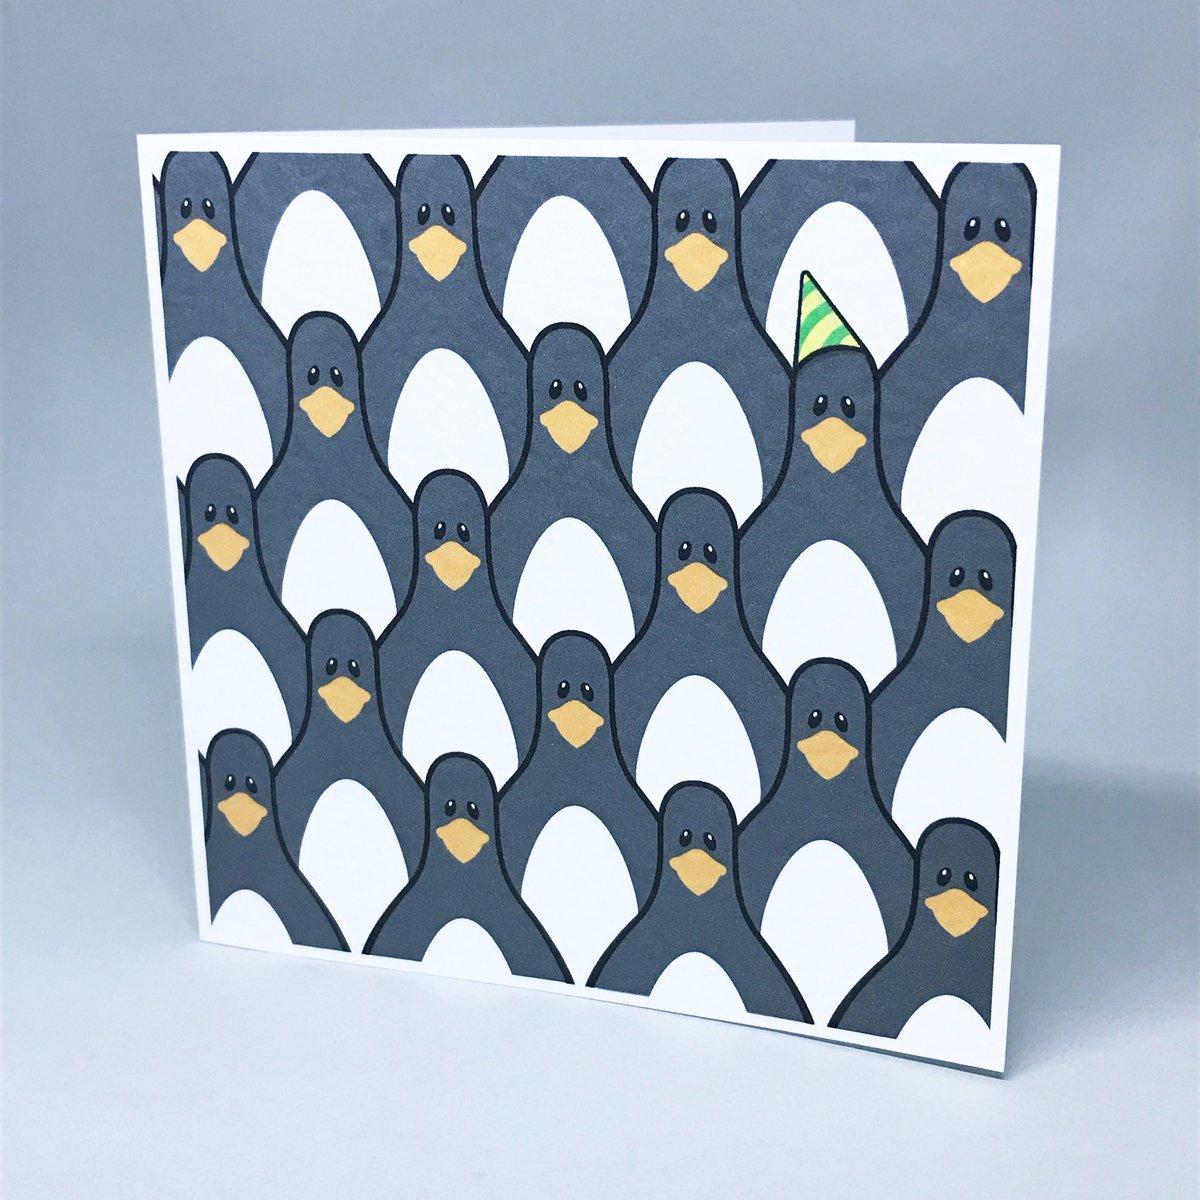 FRIDAY!!! Card available at https://t.co/drktLt4FeZ #friday #fridayfeeling #penguins #partyhat #huddle #card #greetingcards #art #drawing #illustration #artwork #vector #vectorart #etsy #etsyseller #etsyshop #etsysheff #shopsmall #blueprintbear https://t.co/MTDCMMFxD0